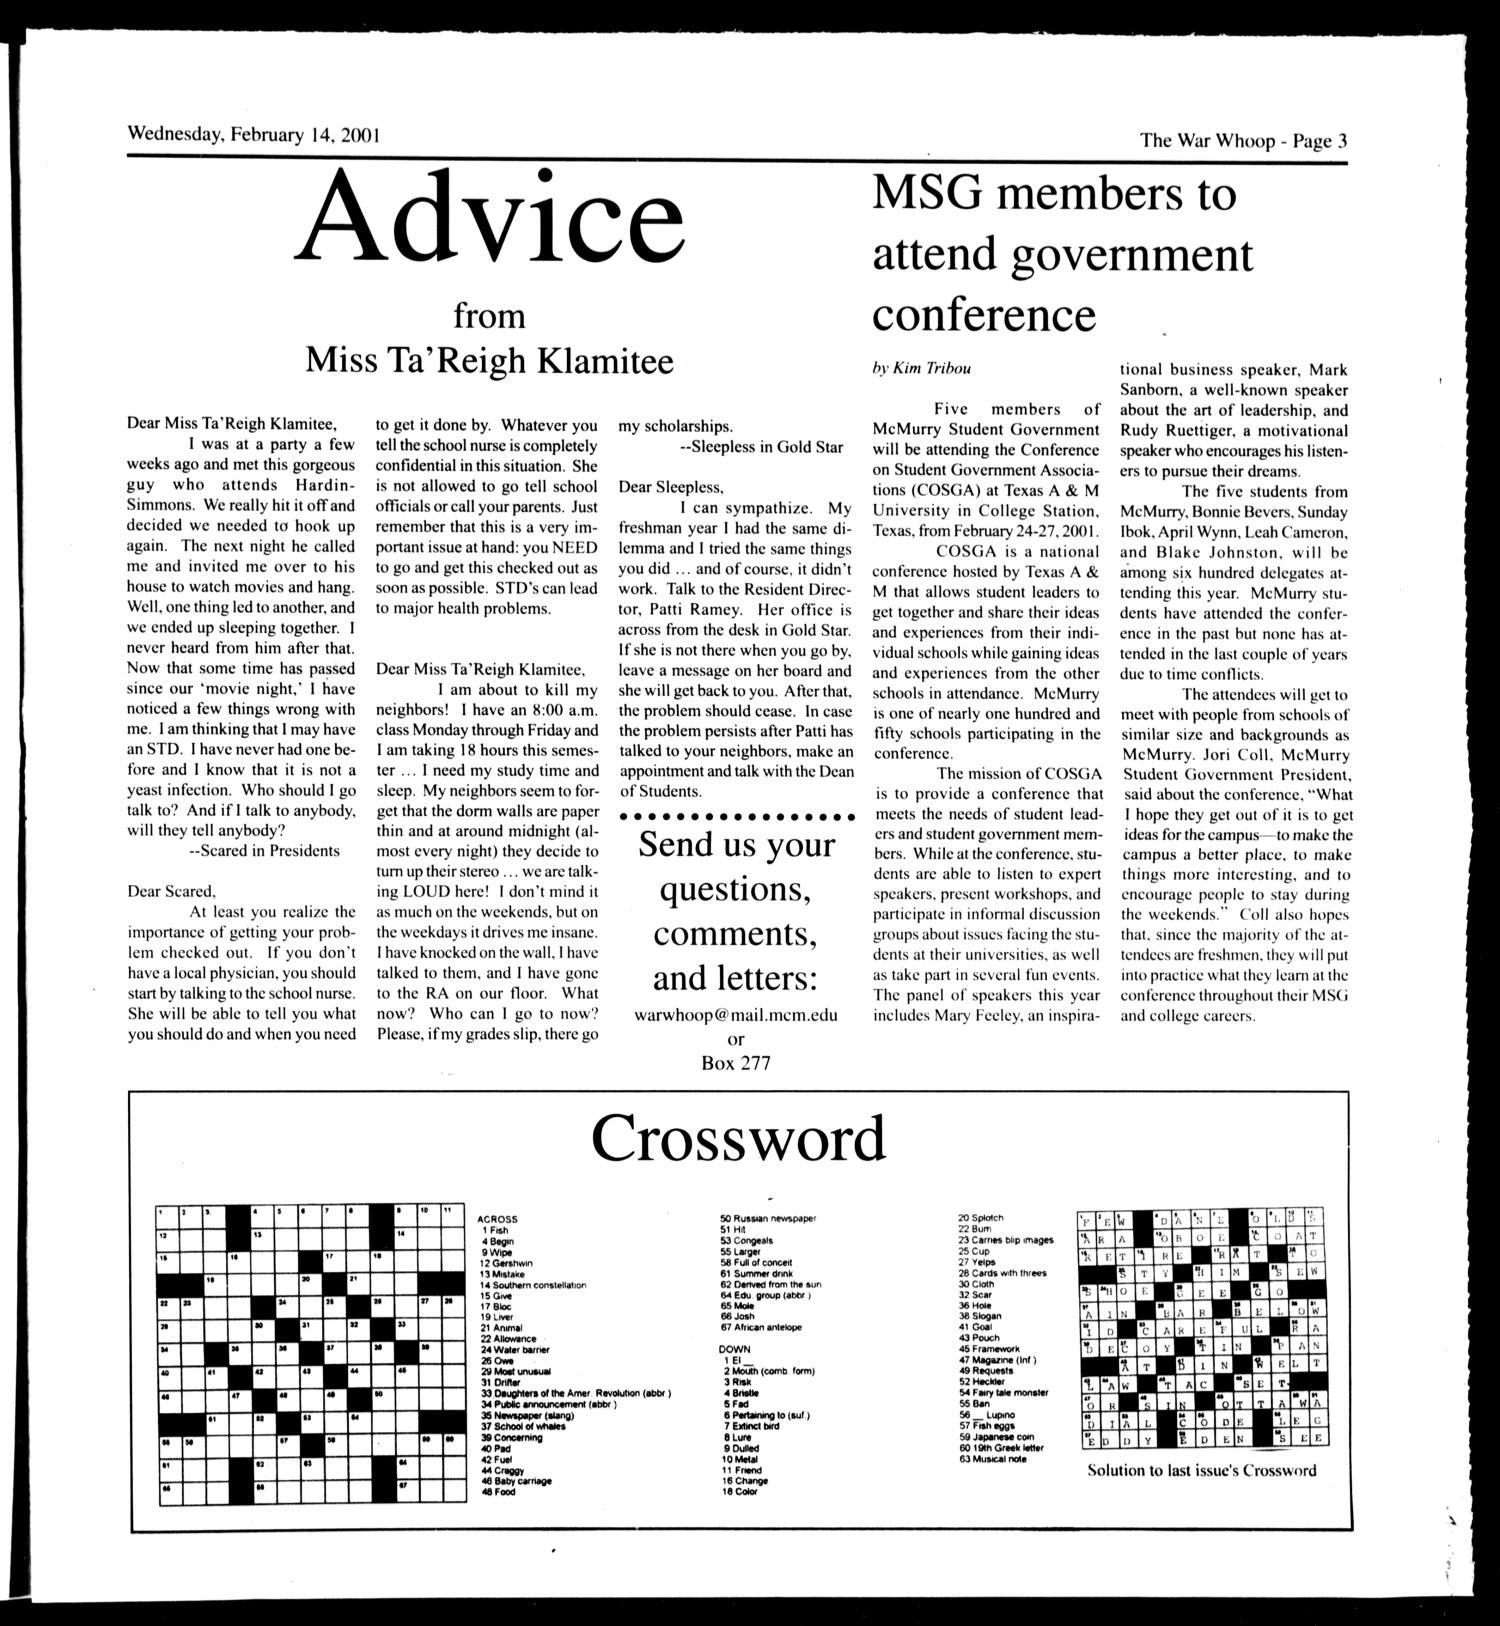 Mcmurry War Whoop Abilene Tex Vol 77 No 8 Ed 1